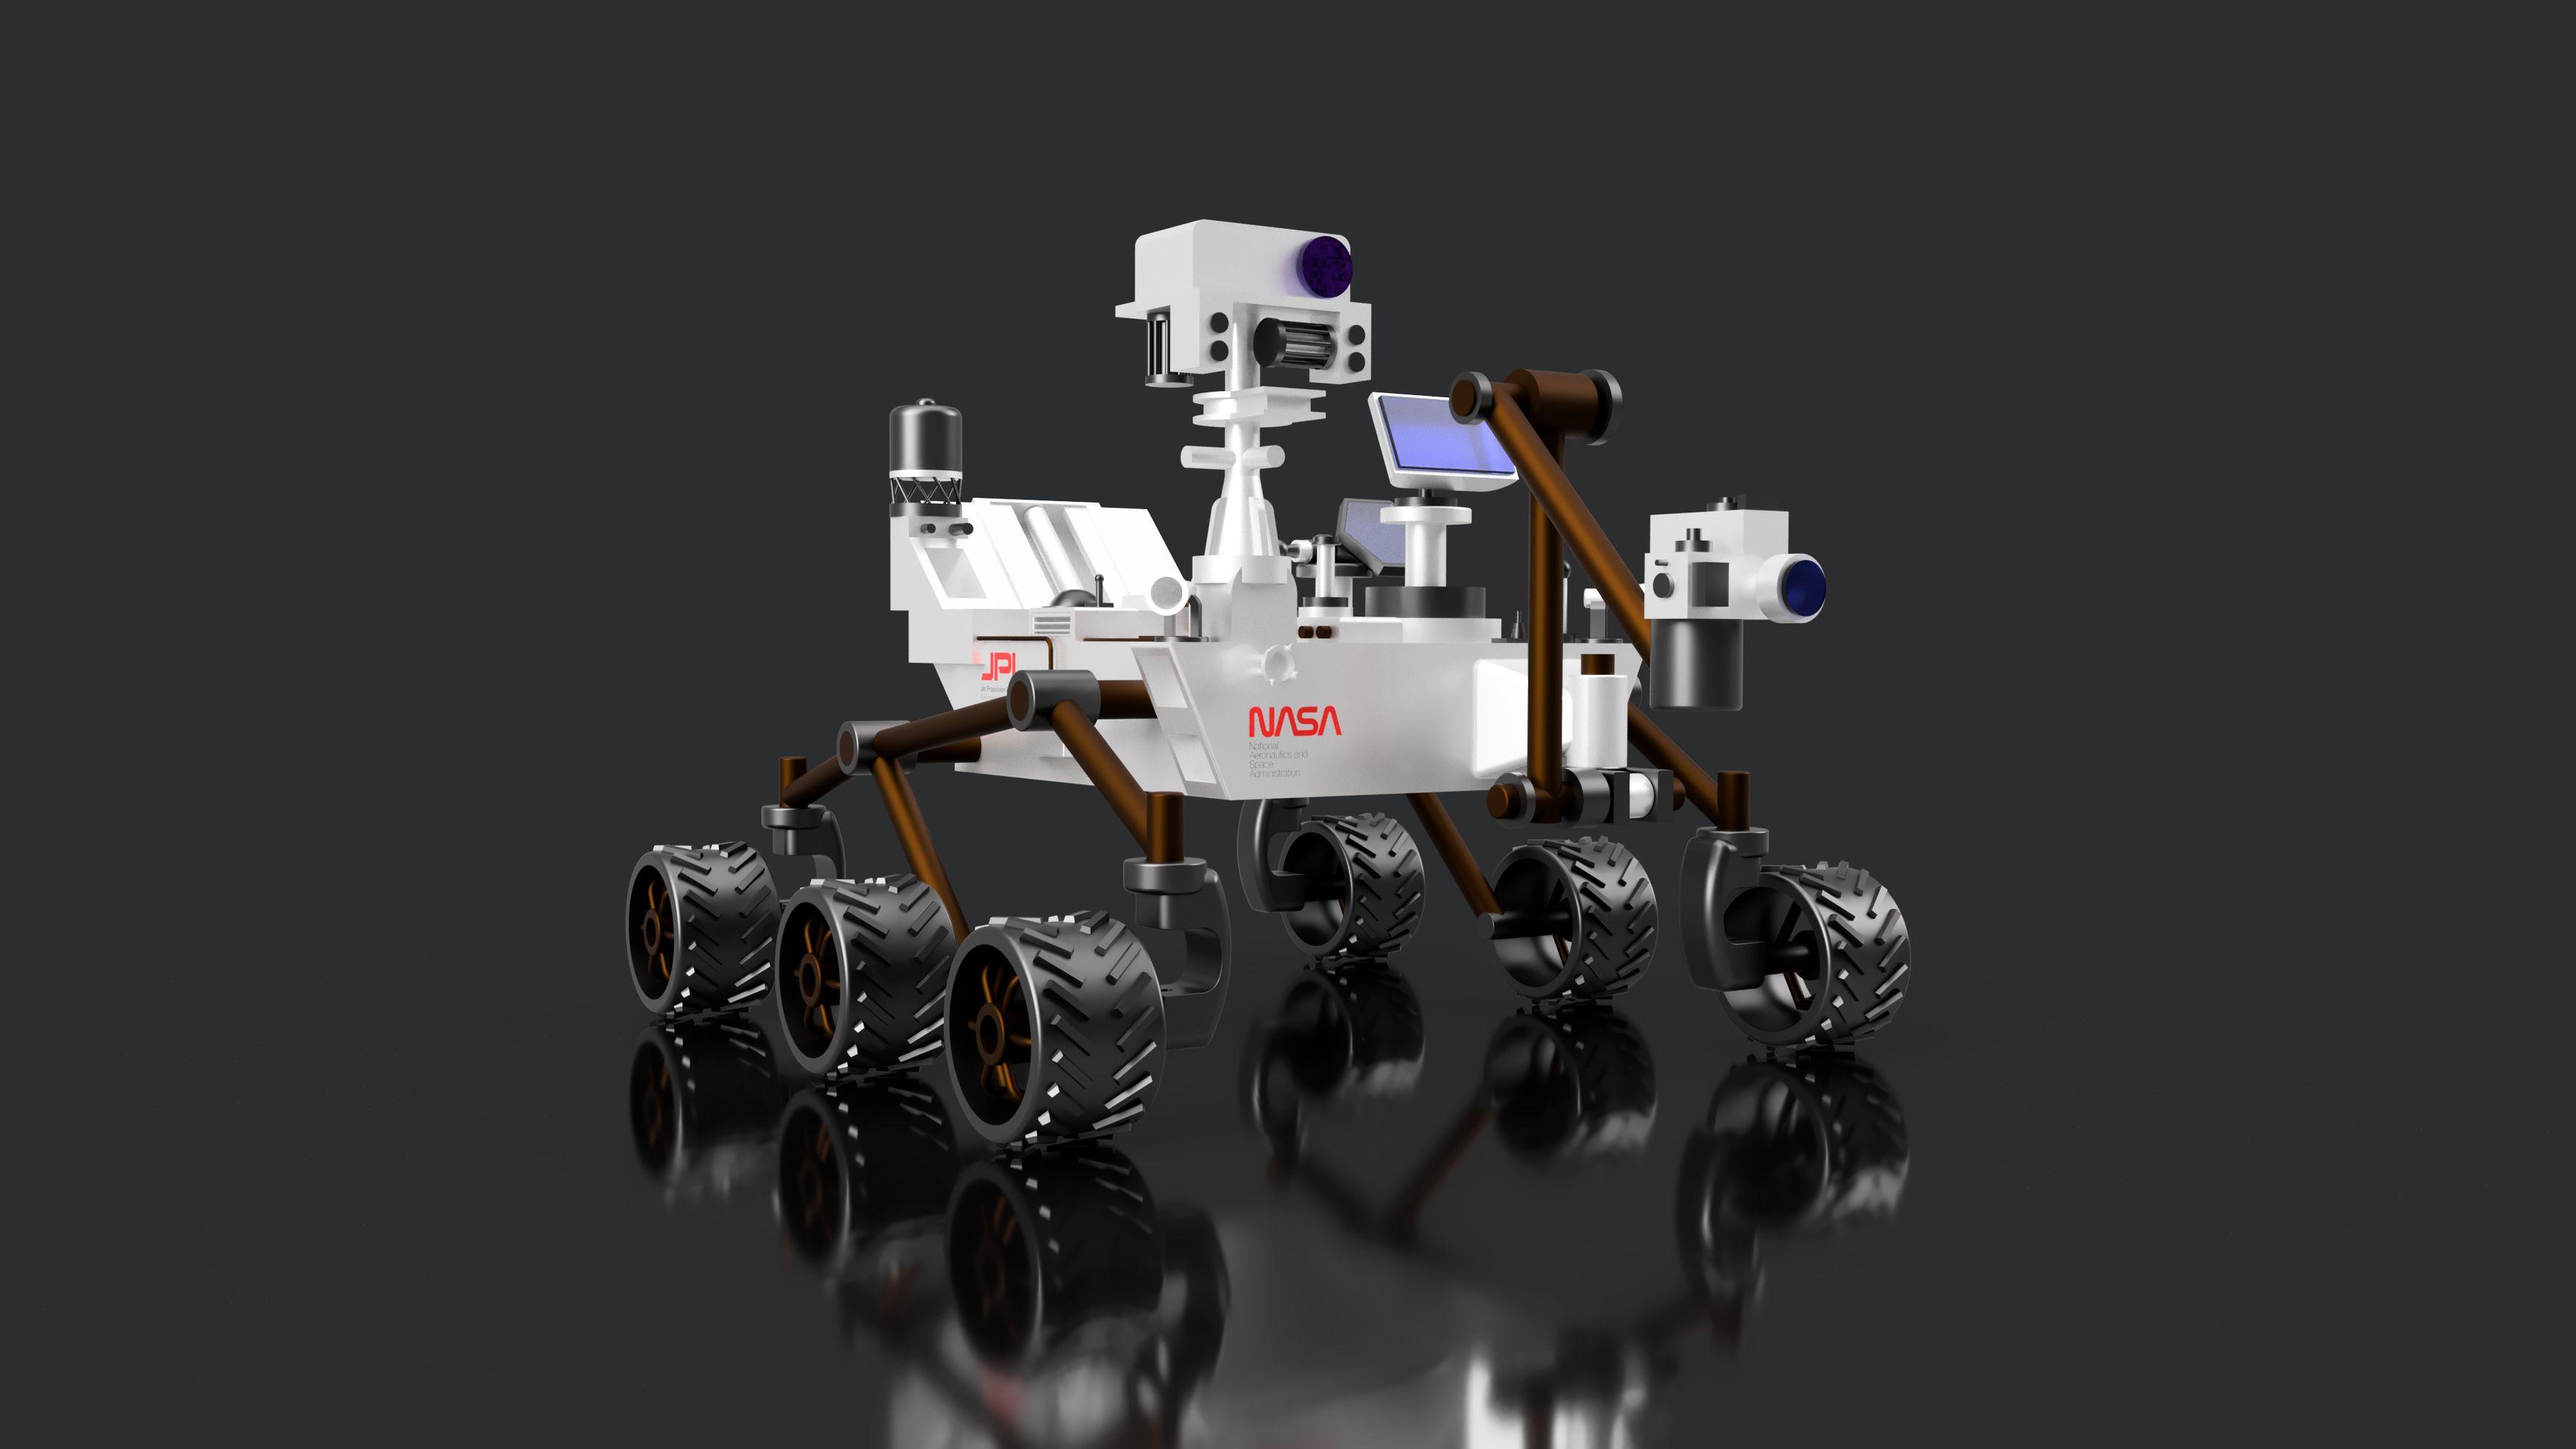 Robot-space-nasa---lcs2020-2020-may-06-09-58-32pm-000-customizedview9017311449-png-3500-3500